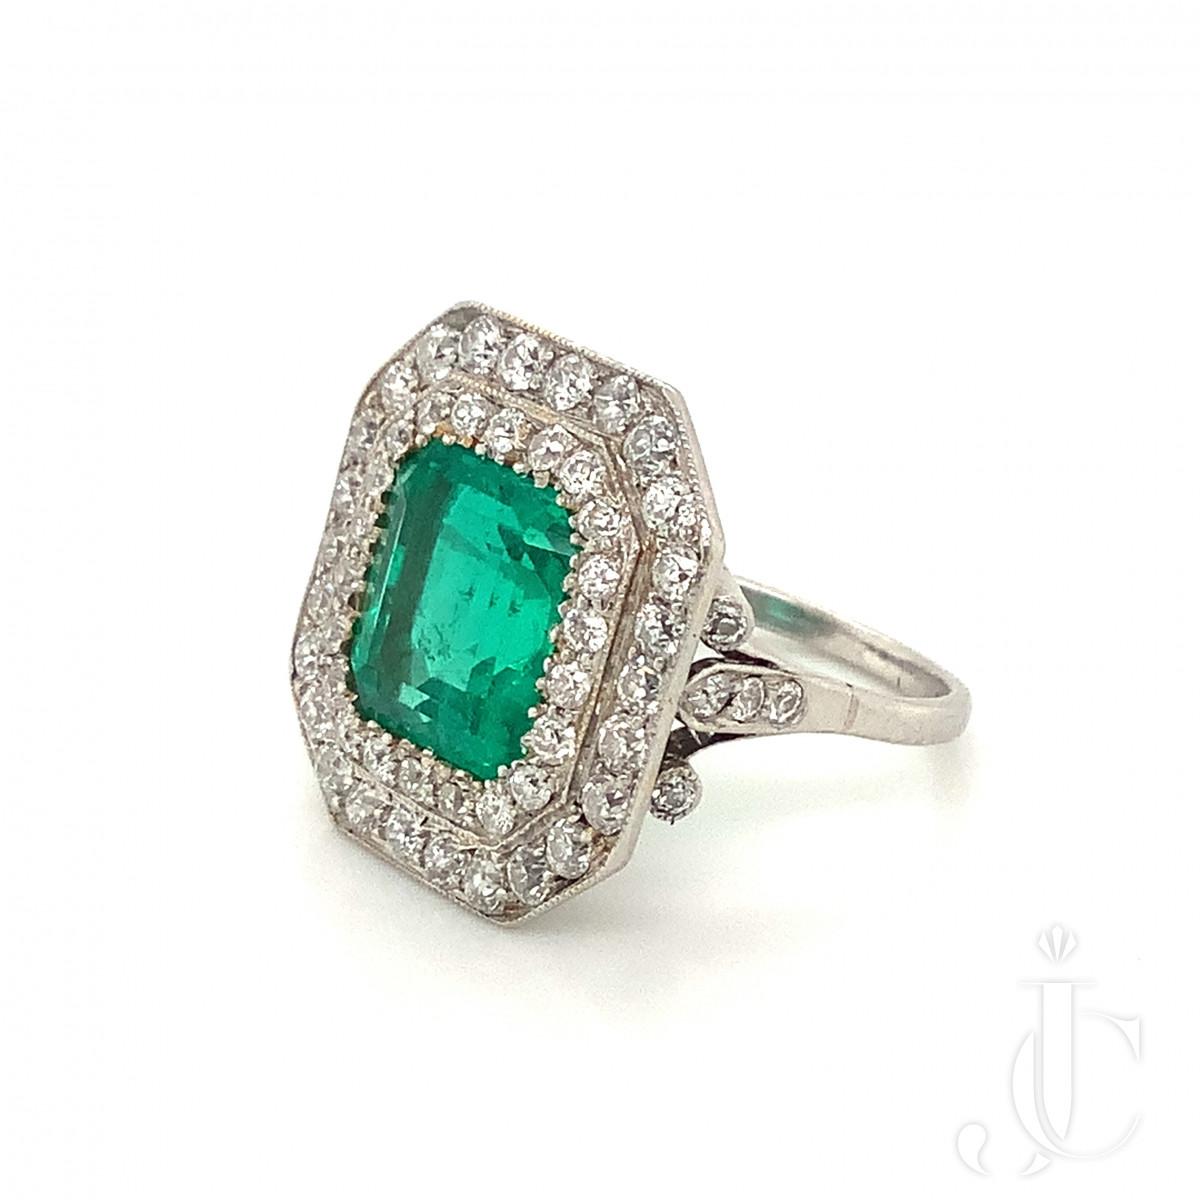 Spaulding Emerald Ring